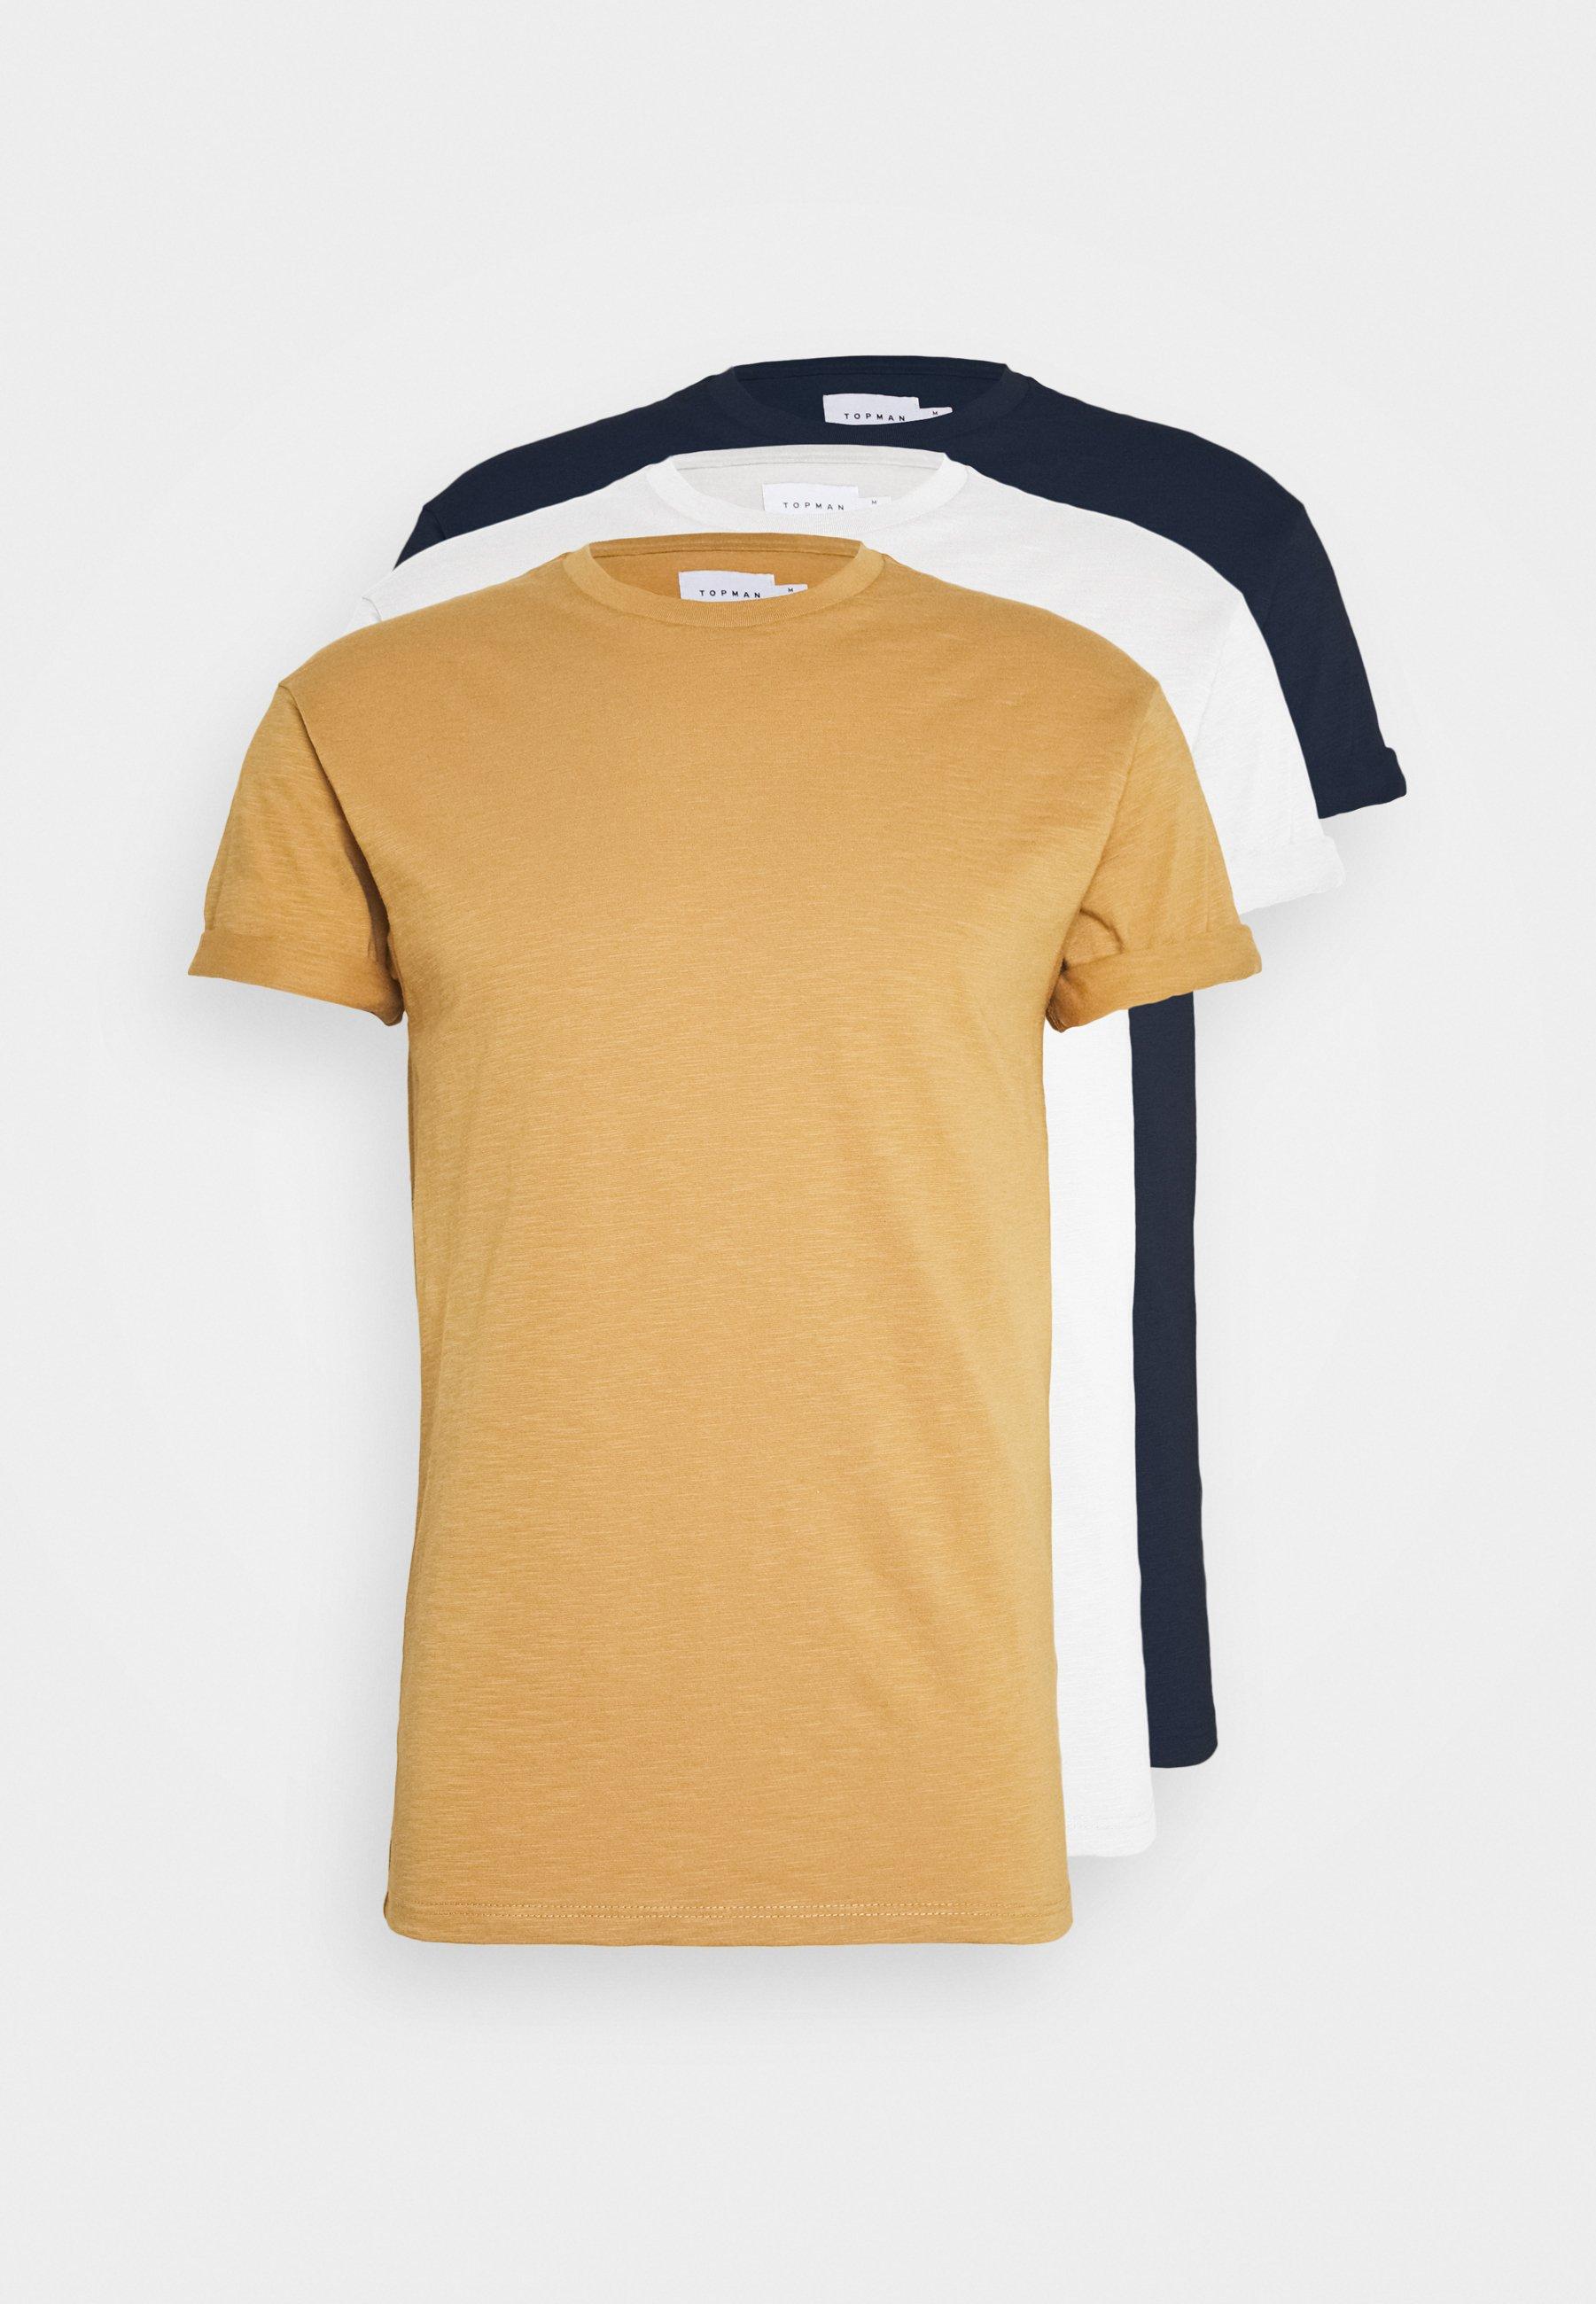 Topman 3 PACK T shirt basique beigekhakiblack ZALANDO.FR